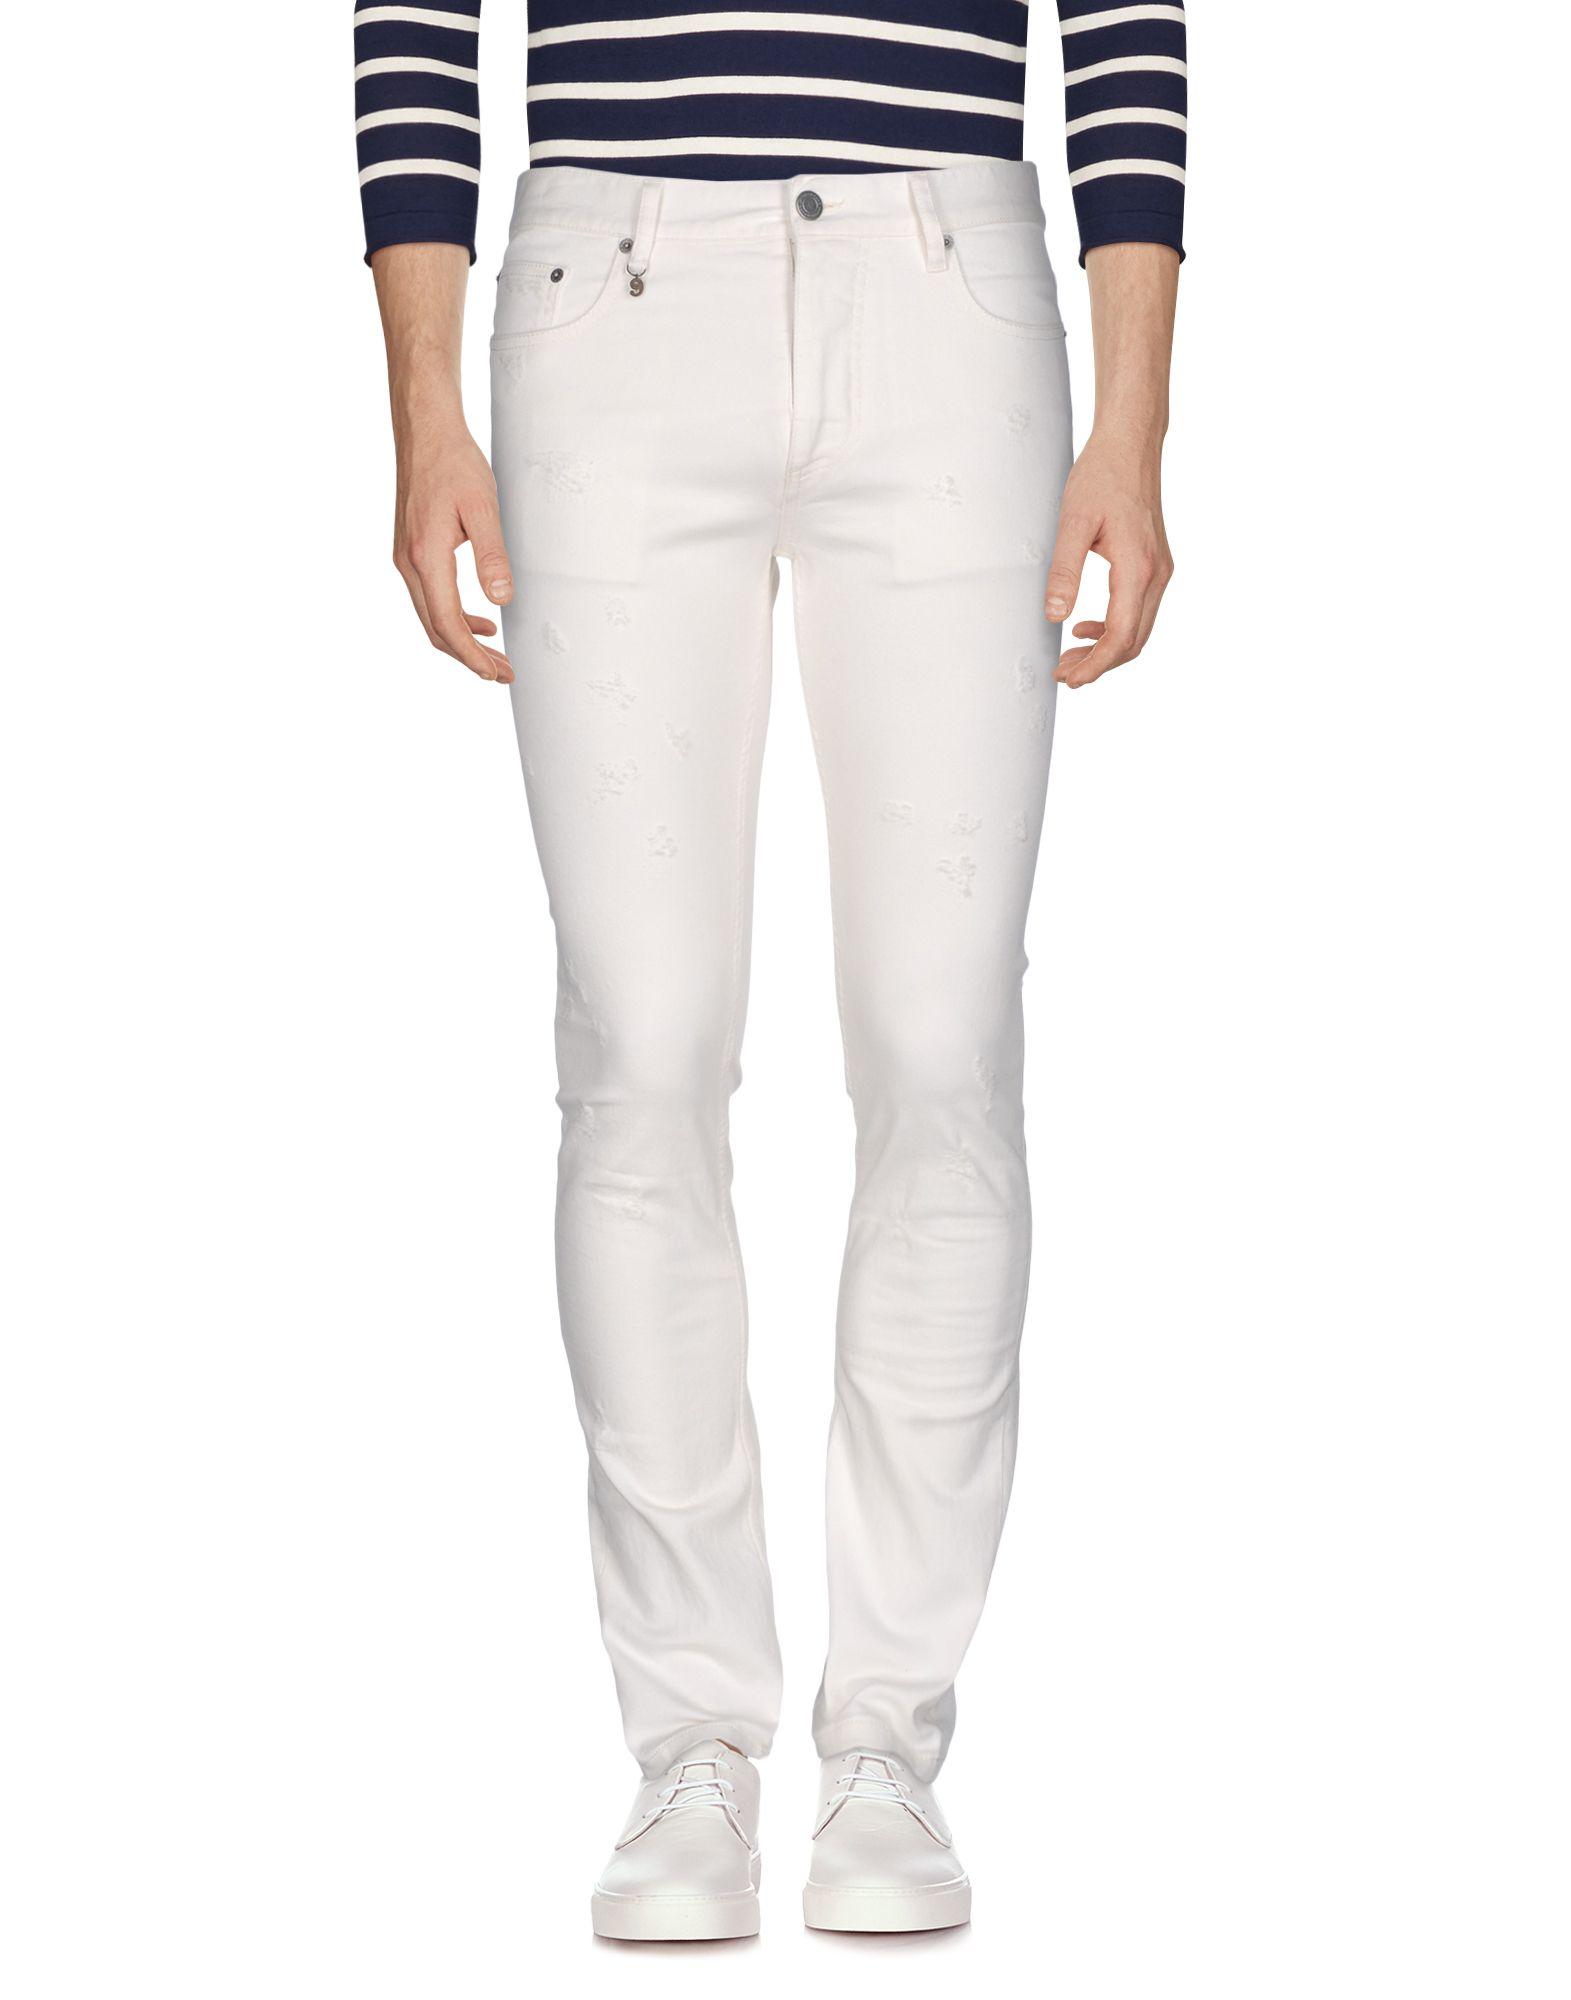 Pantaloni Jeans Marc Jacobs Uomo - Acquista online su